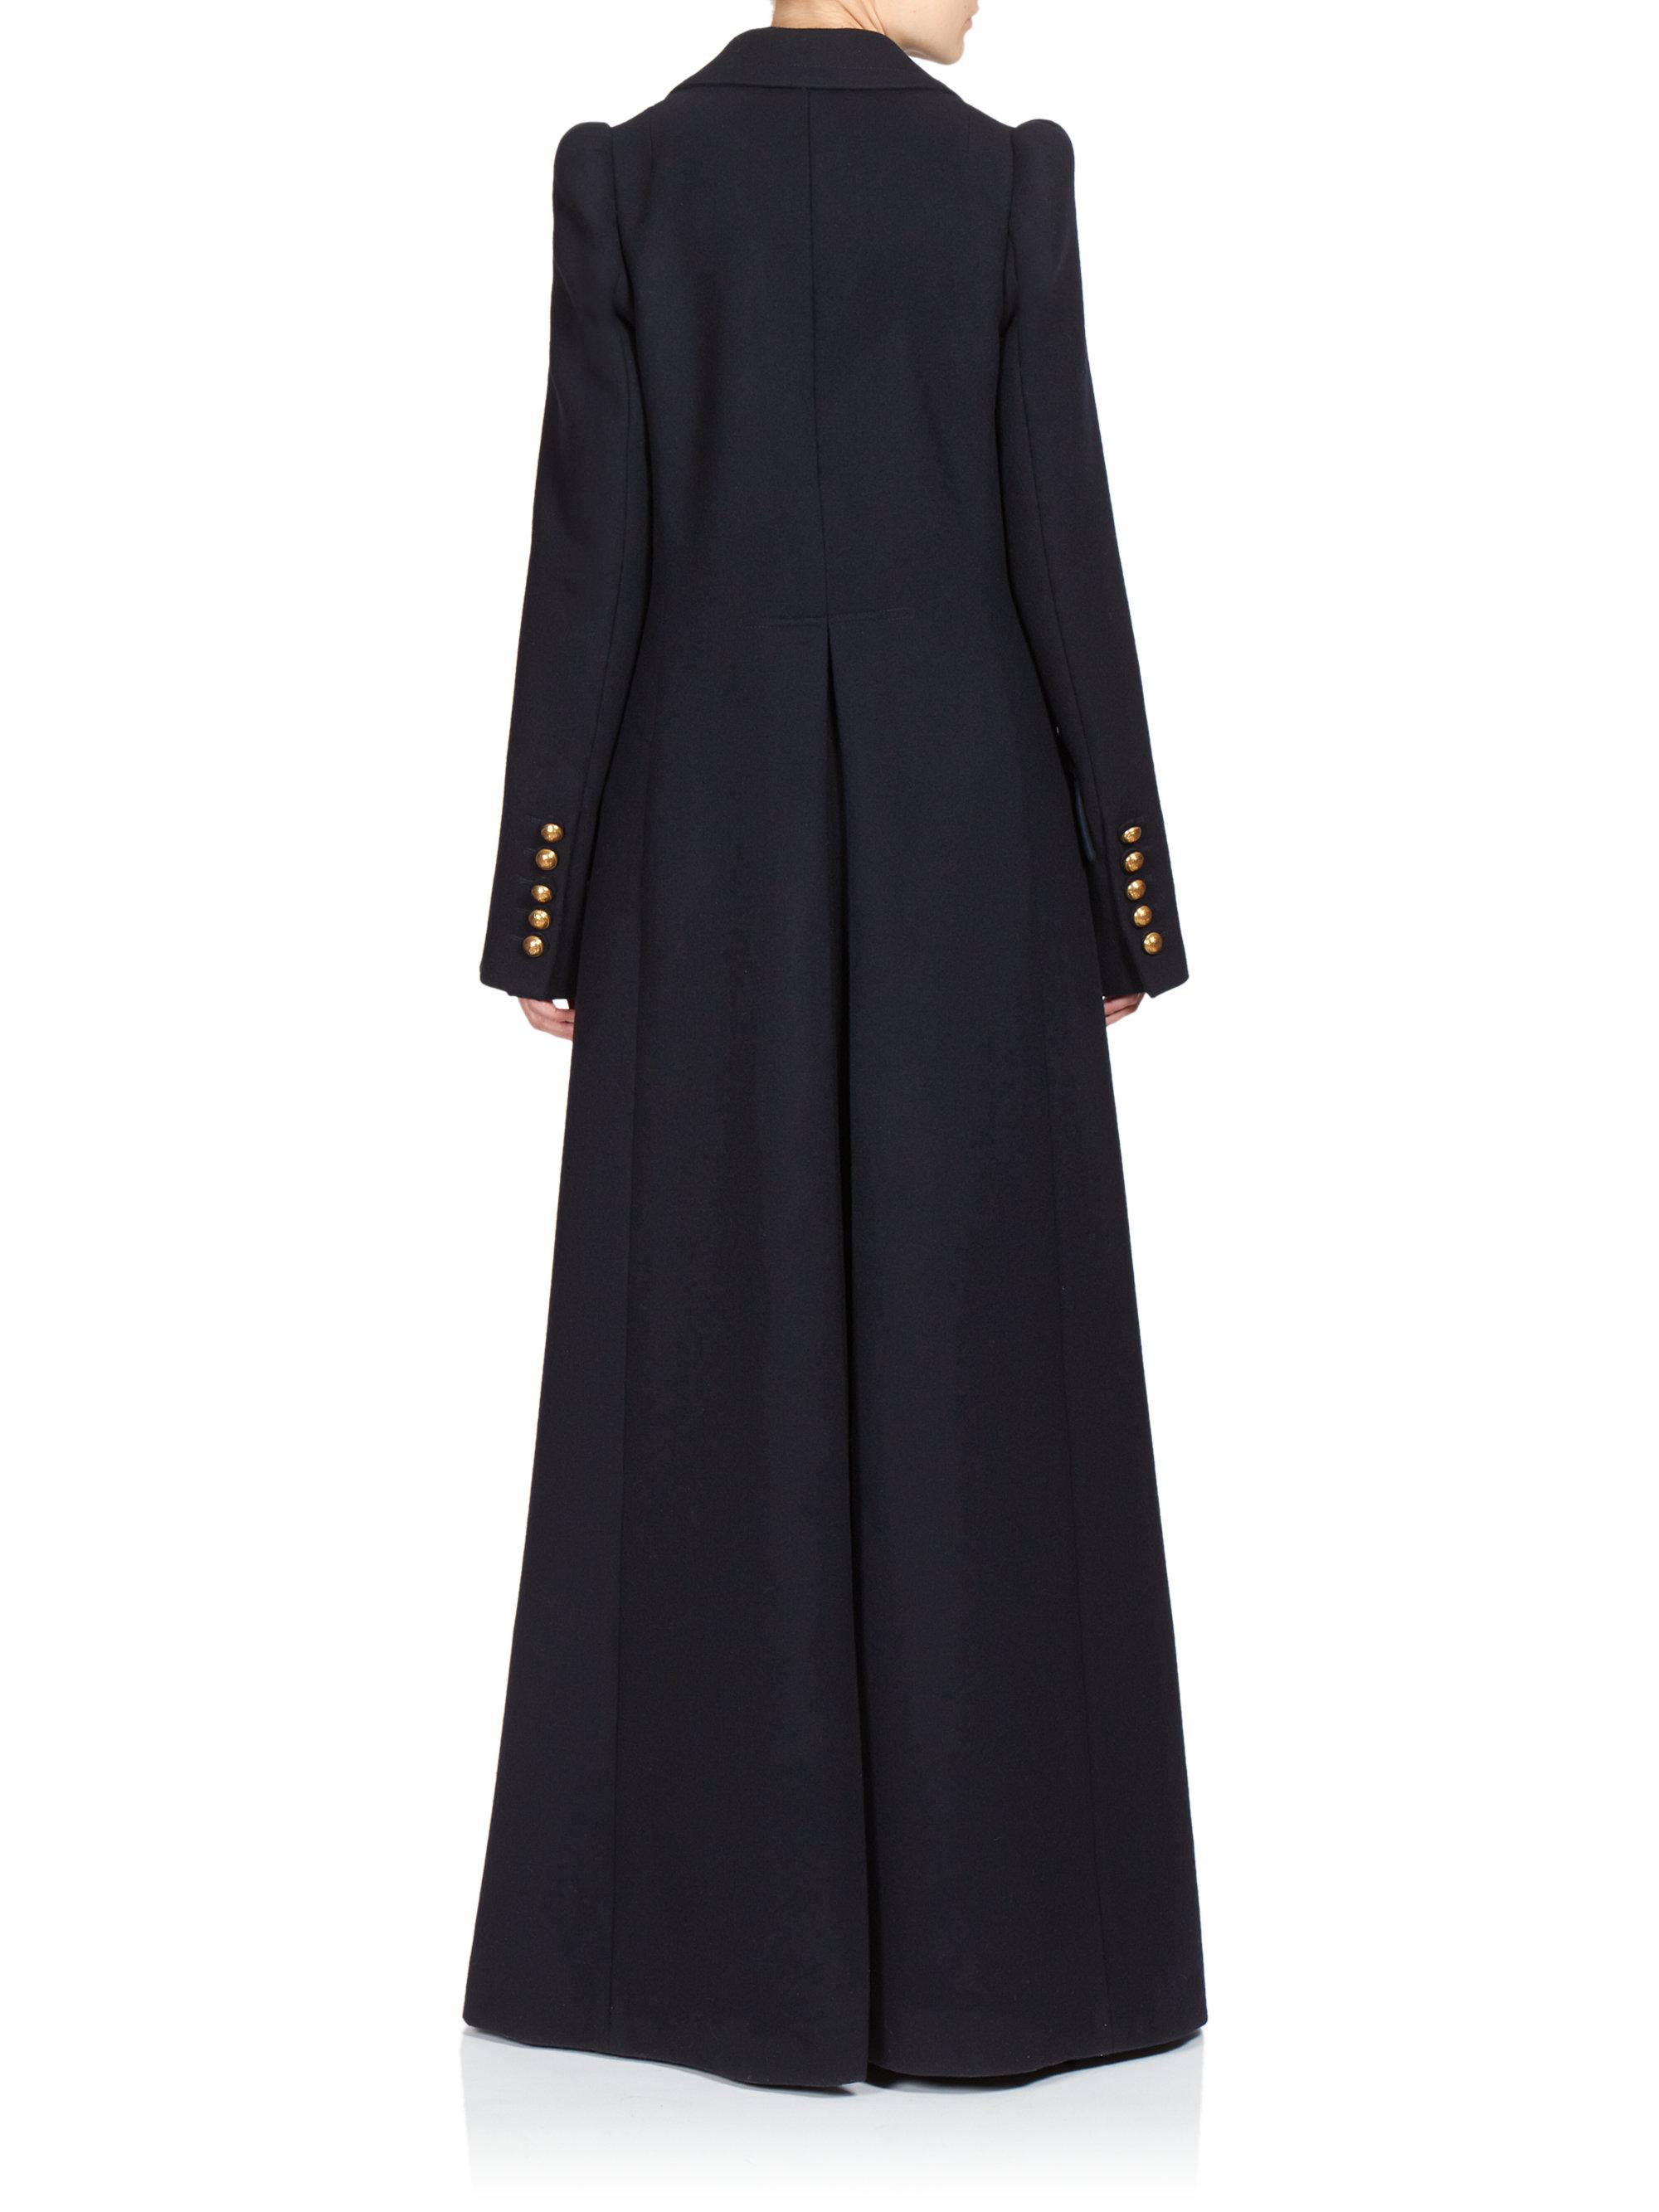 Chloé Wool Long Military Coat in Blue | Lyst